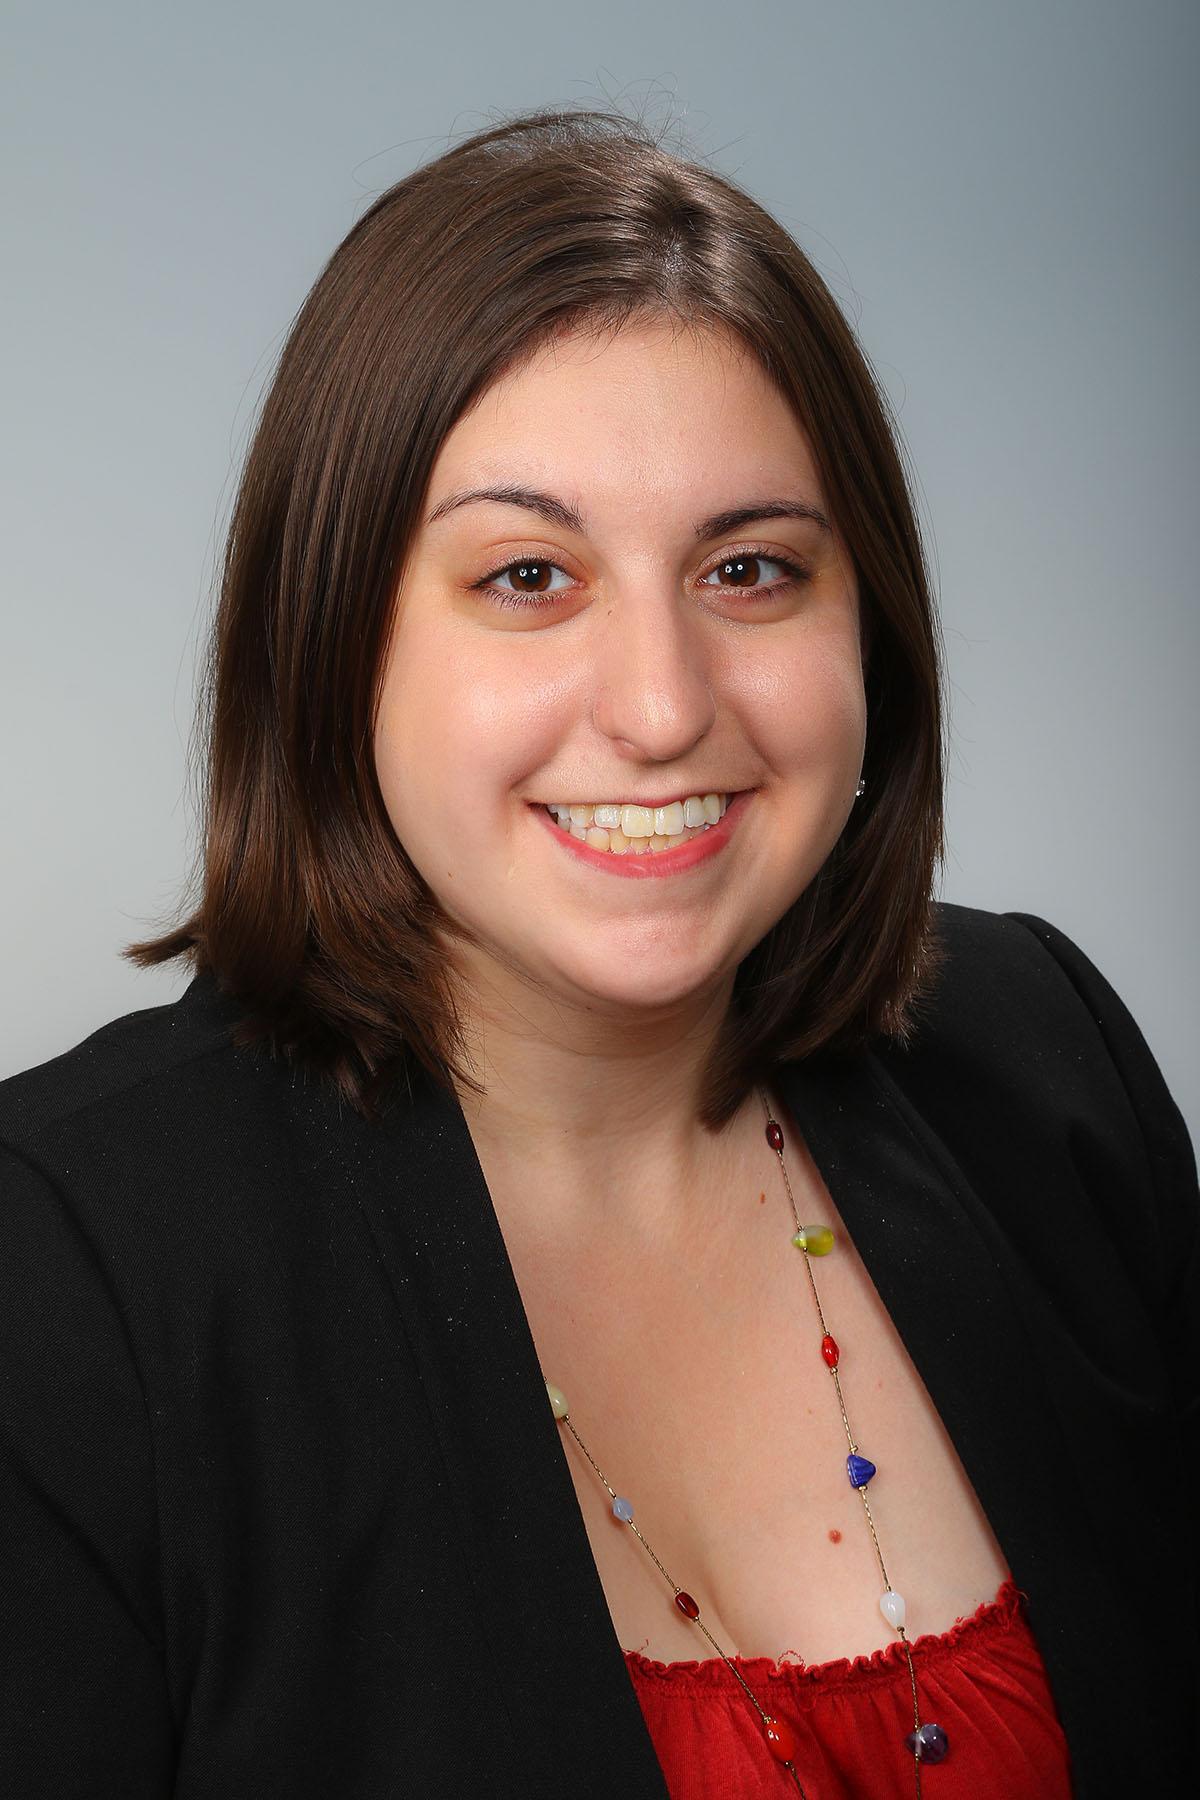 Abby Stern Cardinale